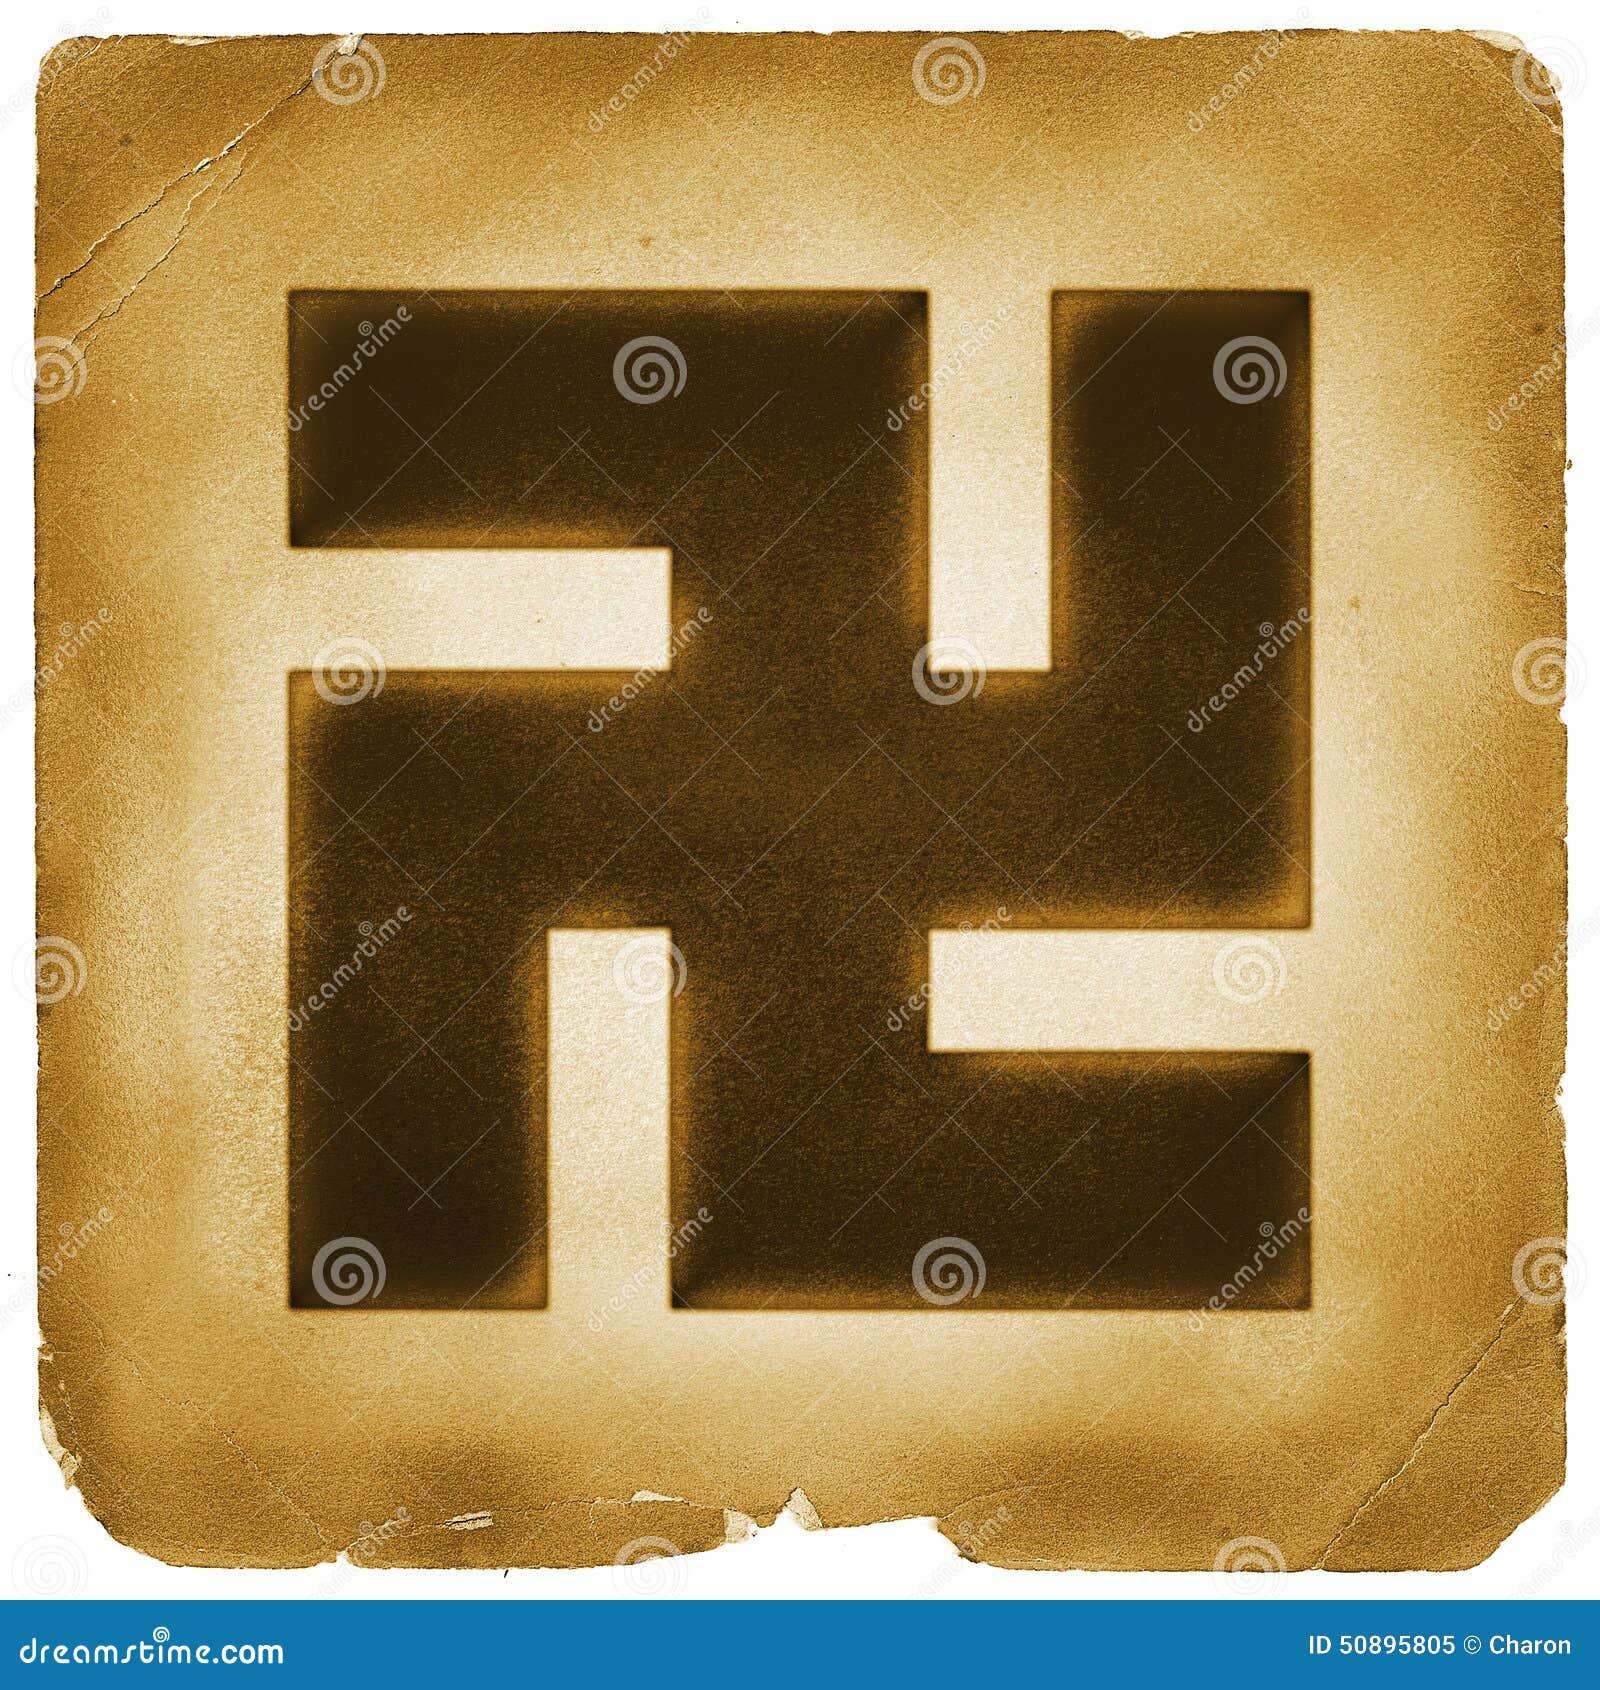 Buddhism swastika buddha sign old paper stock illustration buddhism swastika buddha sign old paper buycottarizona